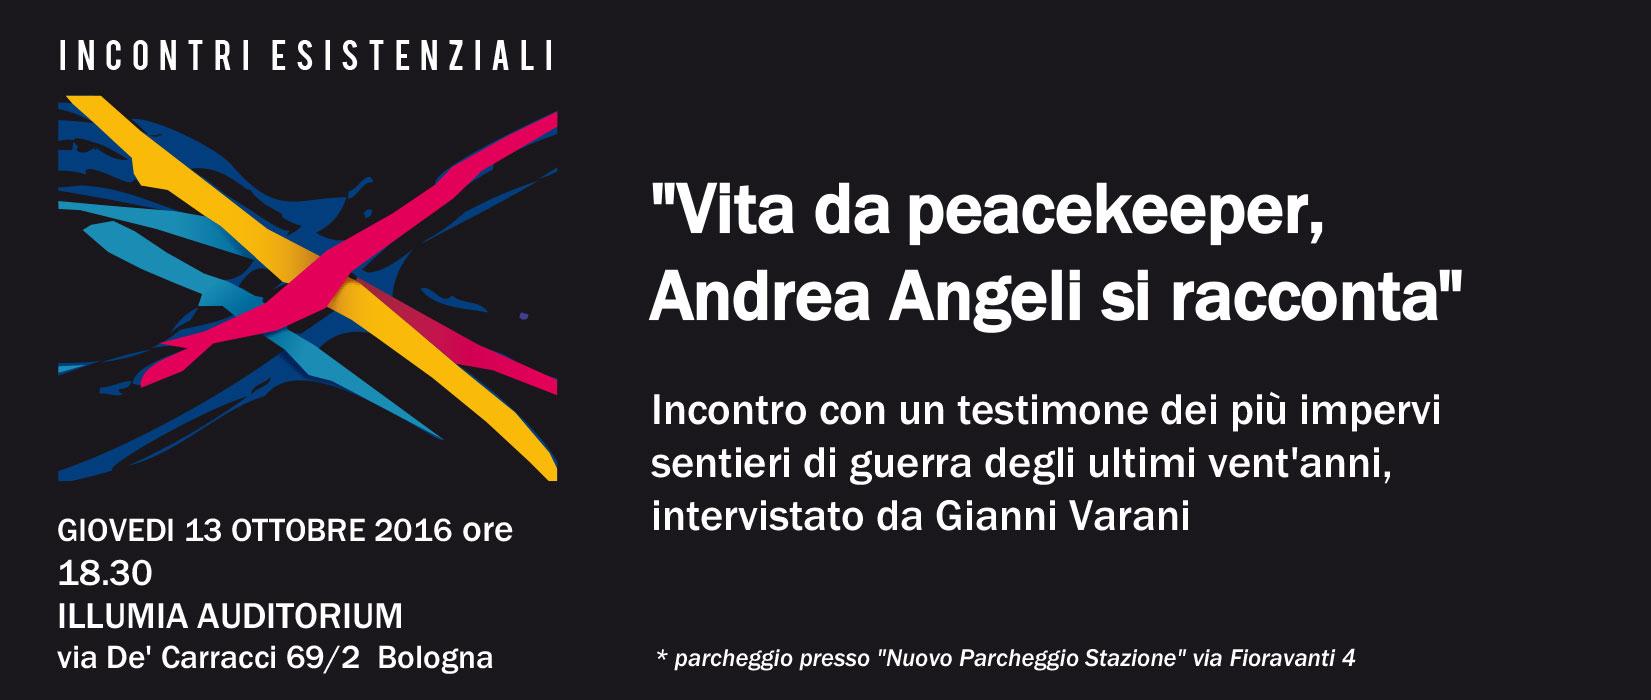 Vita Da Peacekeeper, Andrea Angeli